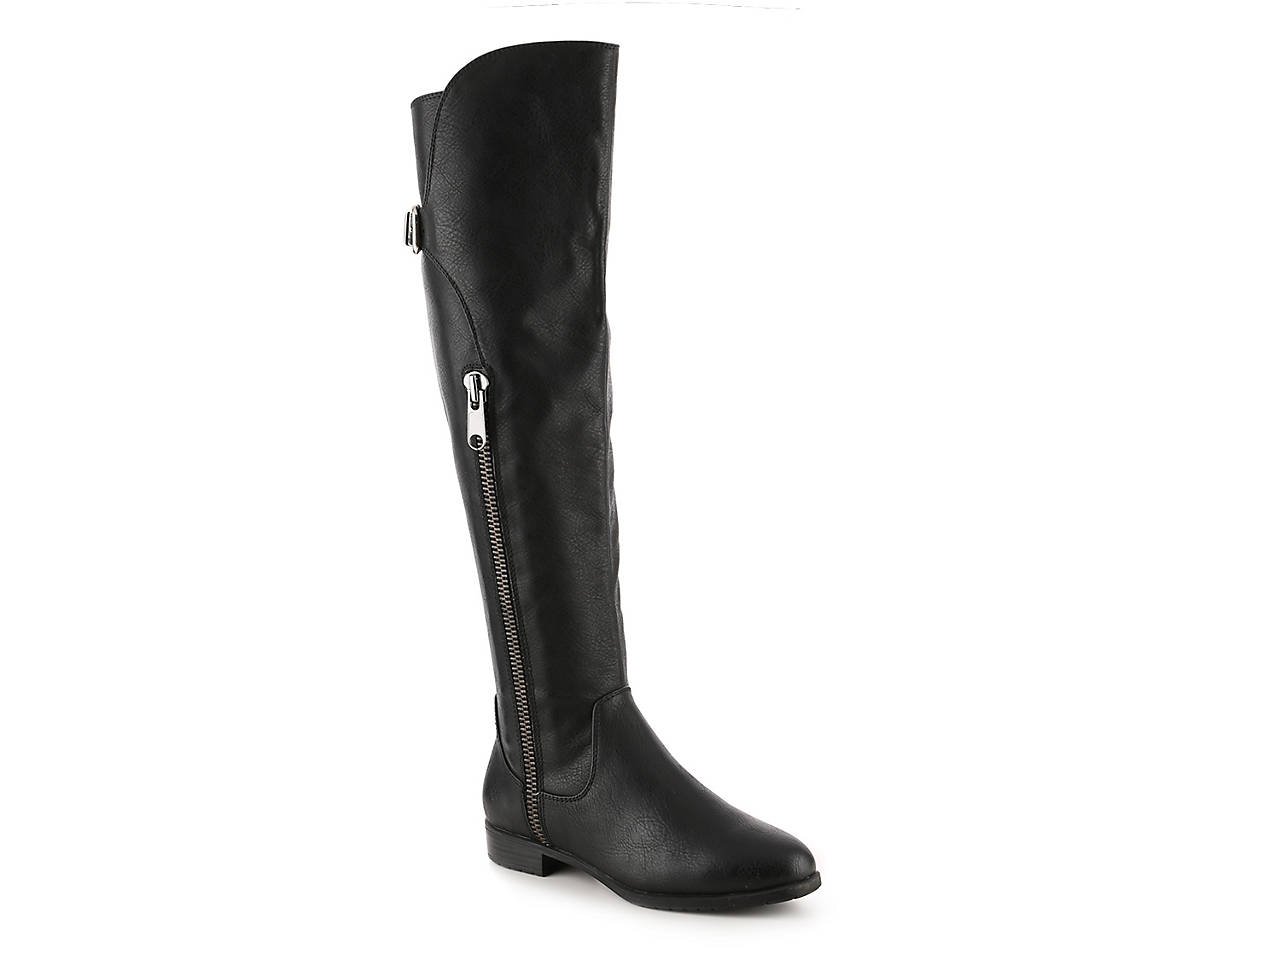 Rialto Firstrow Riding Boot (Women's) 0pQcXB